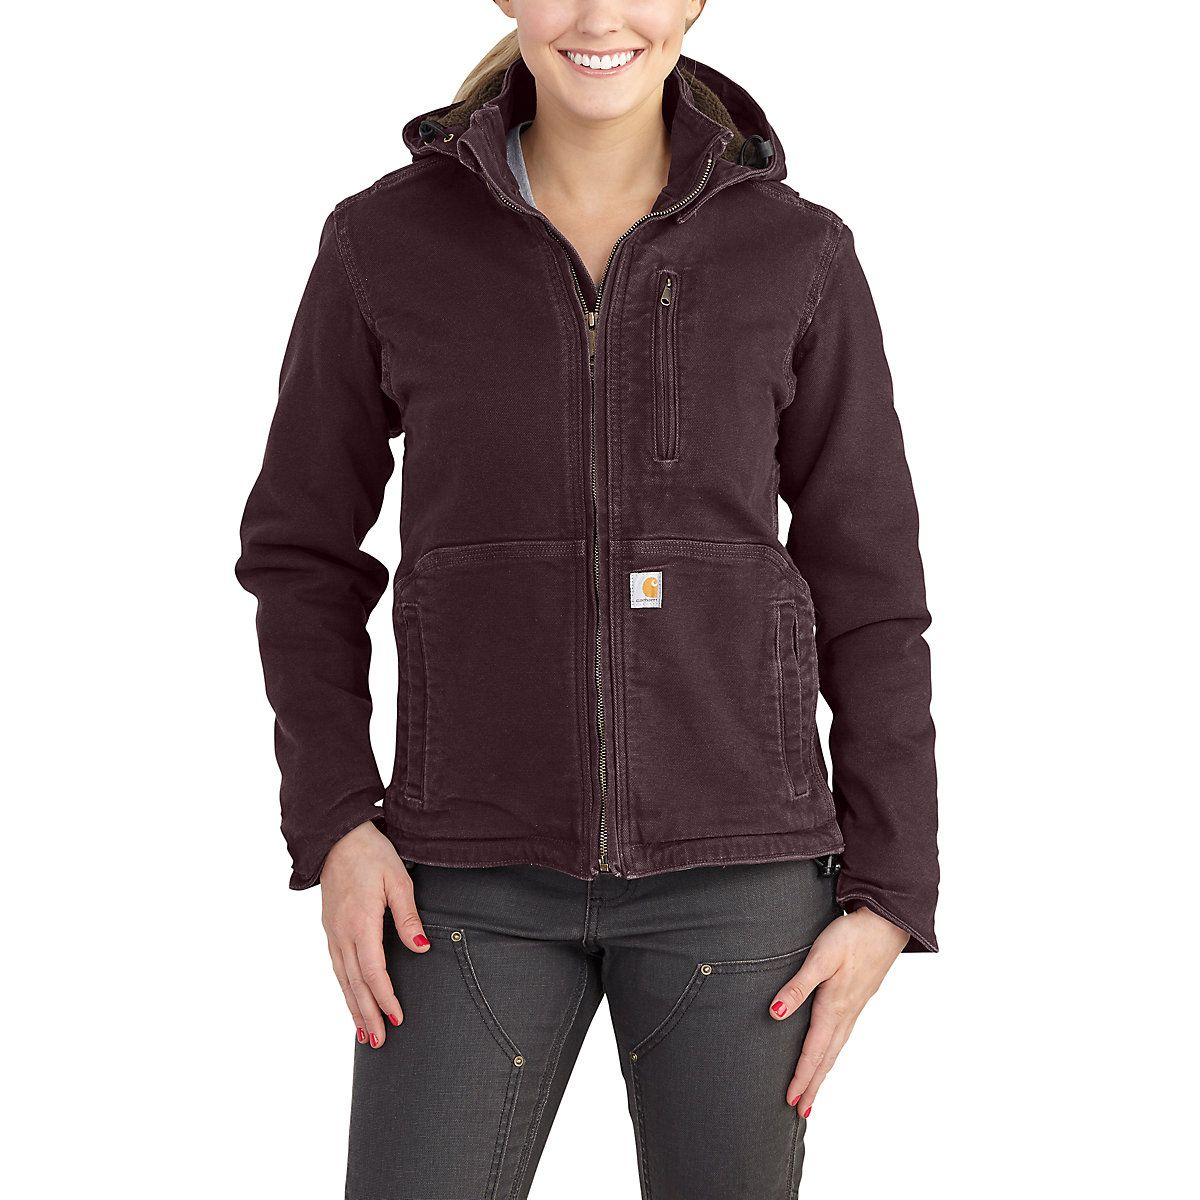 Women S Heavyweight Sandstone Jacket That Gives You Maximum Range Of Movement Carhartt Women Duck Jacket Carhartt [ 1200 x 1200 Pixel ]